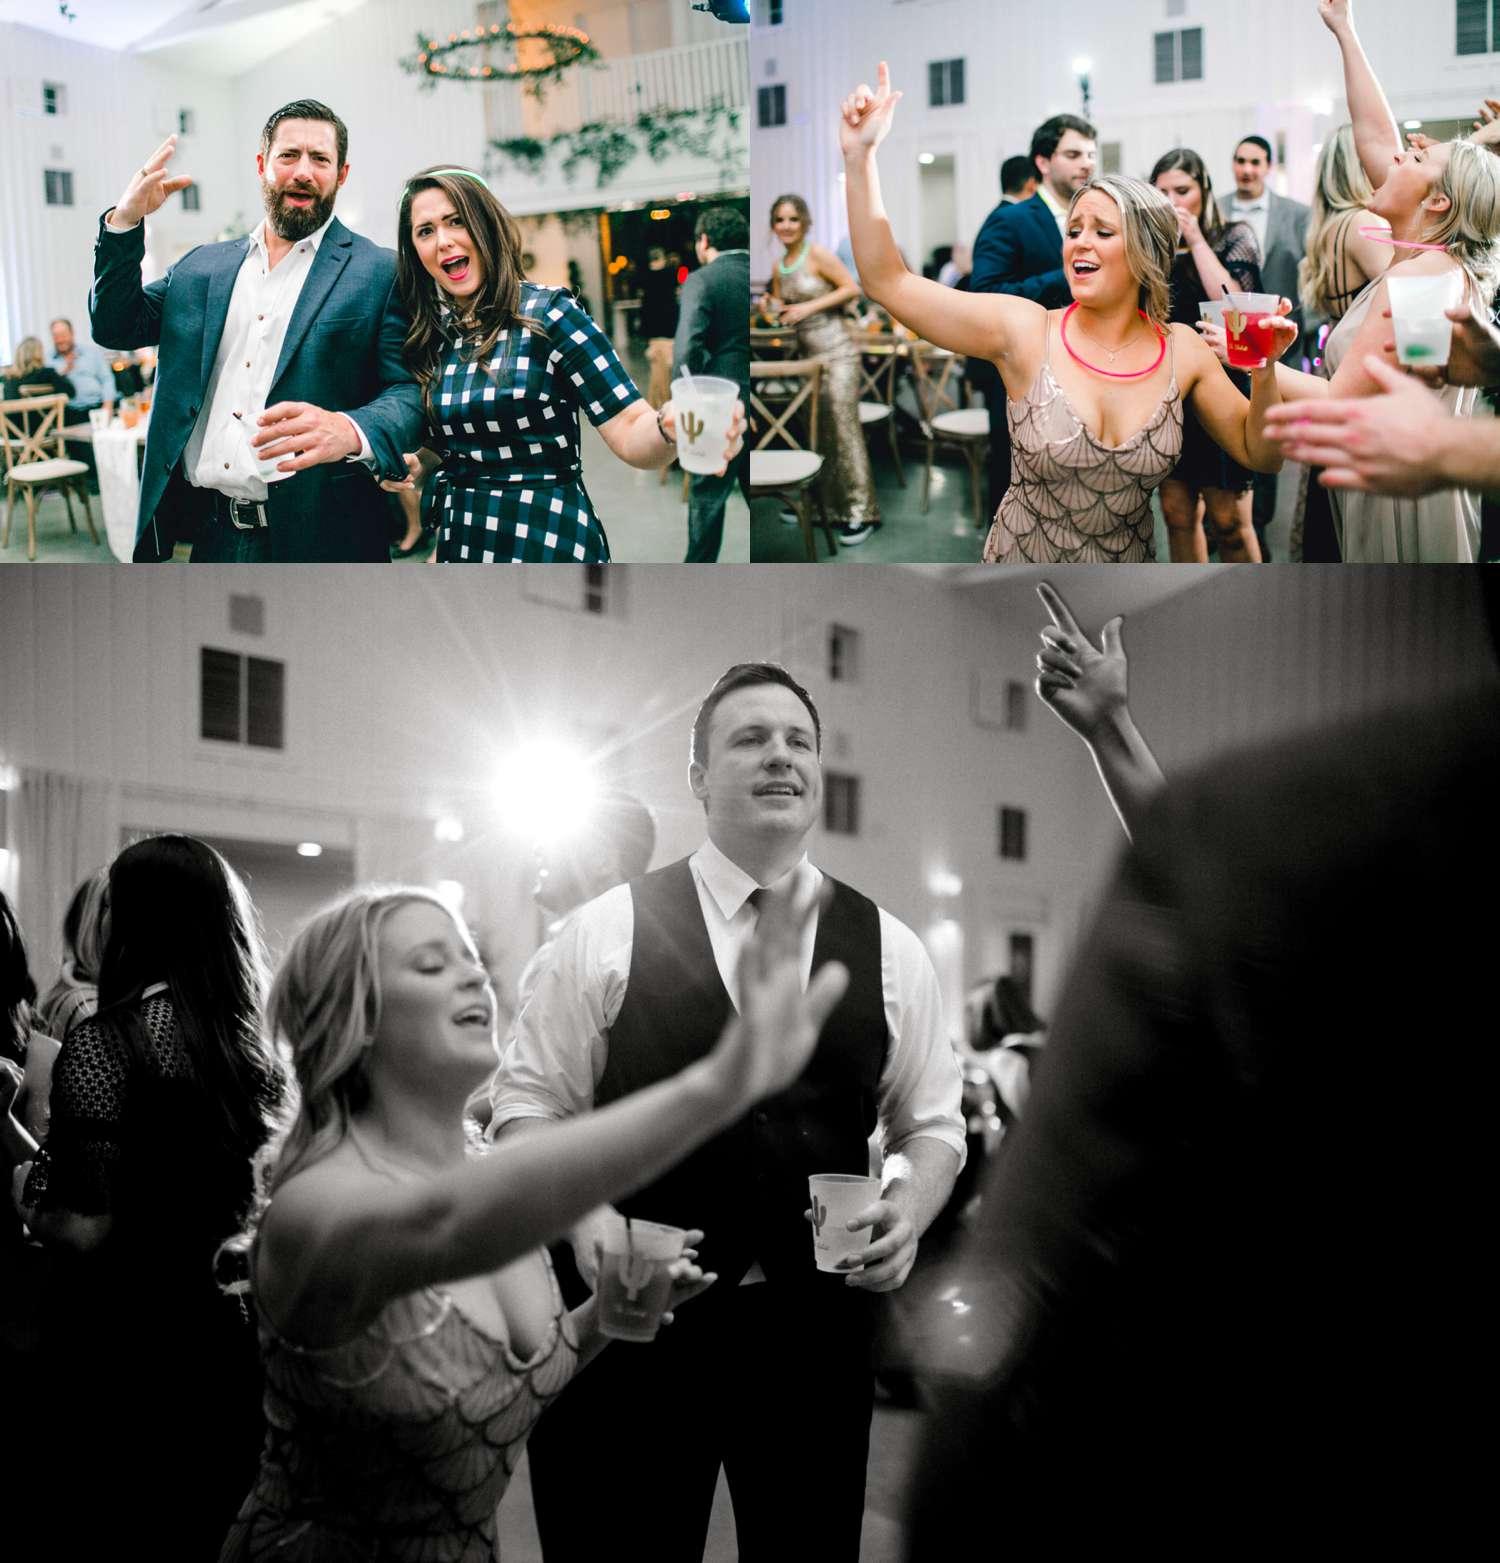 HEBERT_MORGAN_AND_CLAY_ALLEEJ_THE_FARMHOUSE_MONTGOMERY_TEXAS_WEDDING_0234.jpg